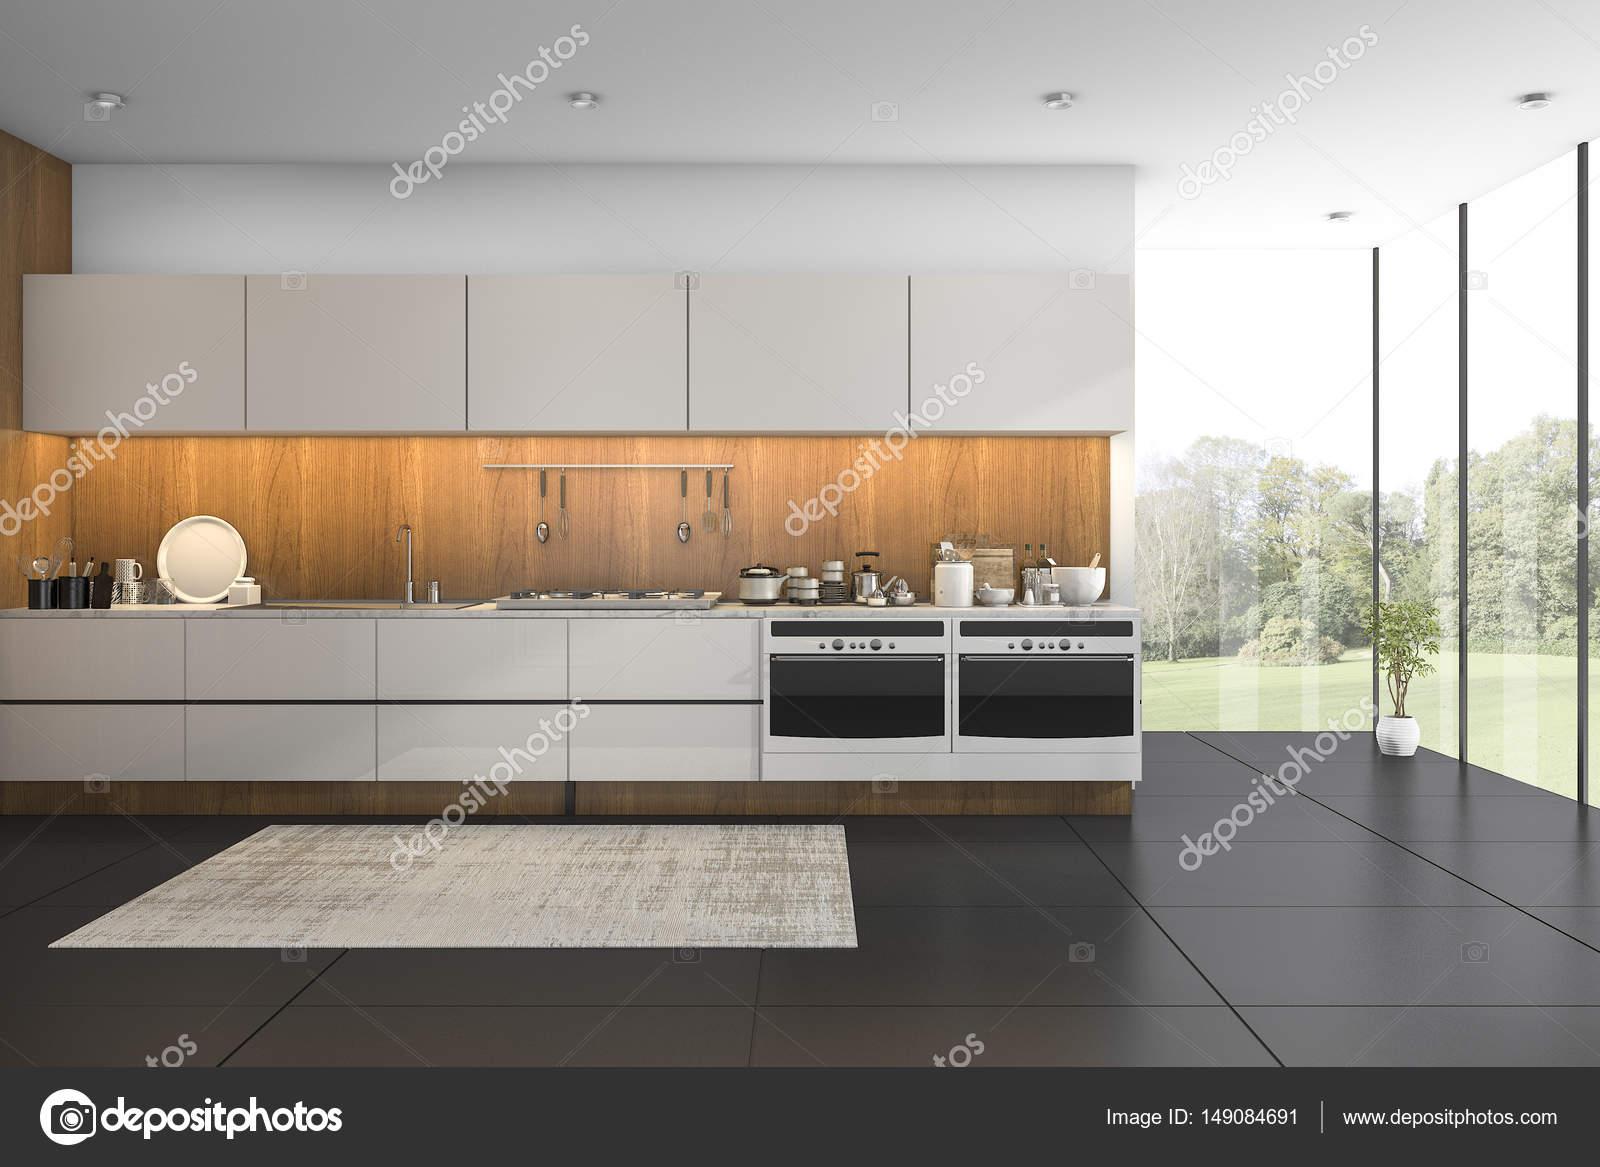 cucina con piastrelle nere in legno vista bel rendering 3D — Foto ...